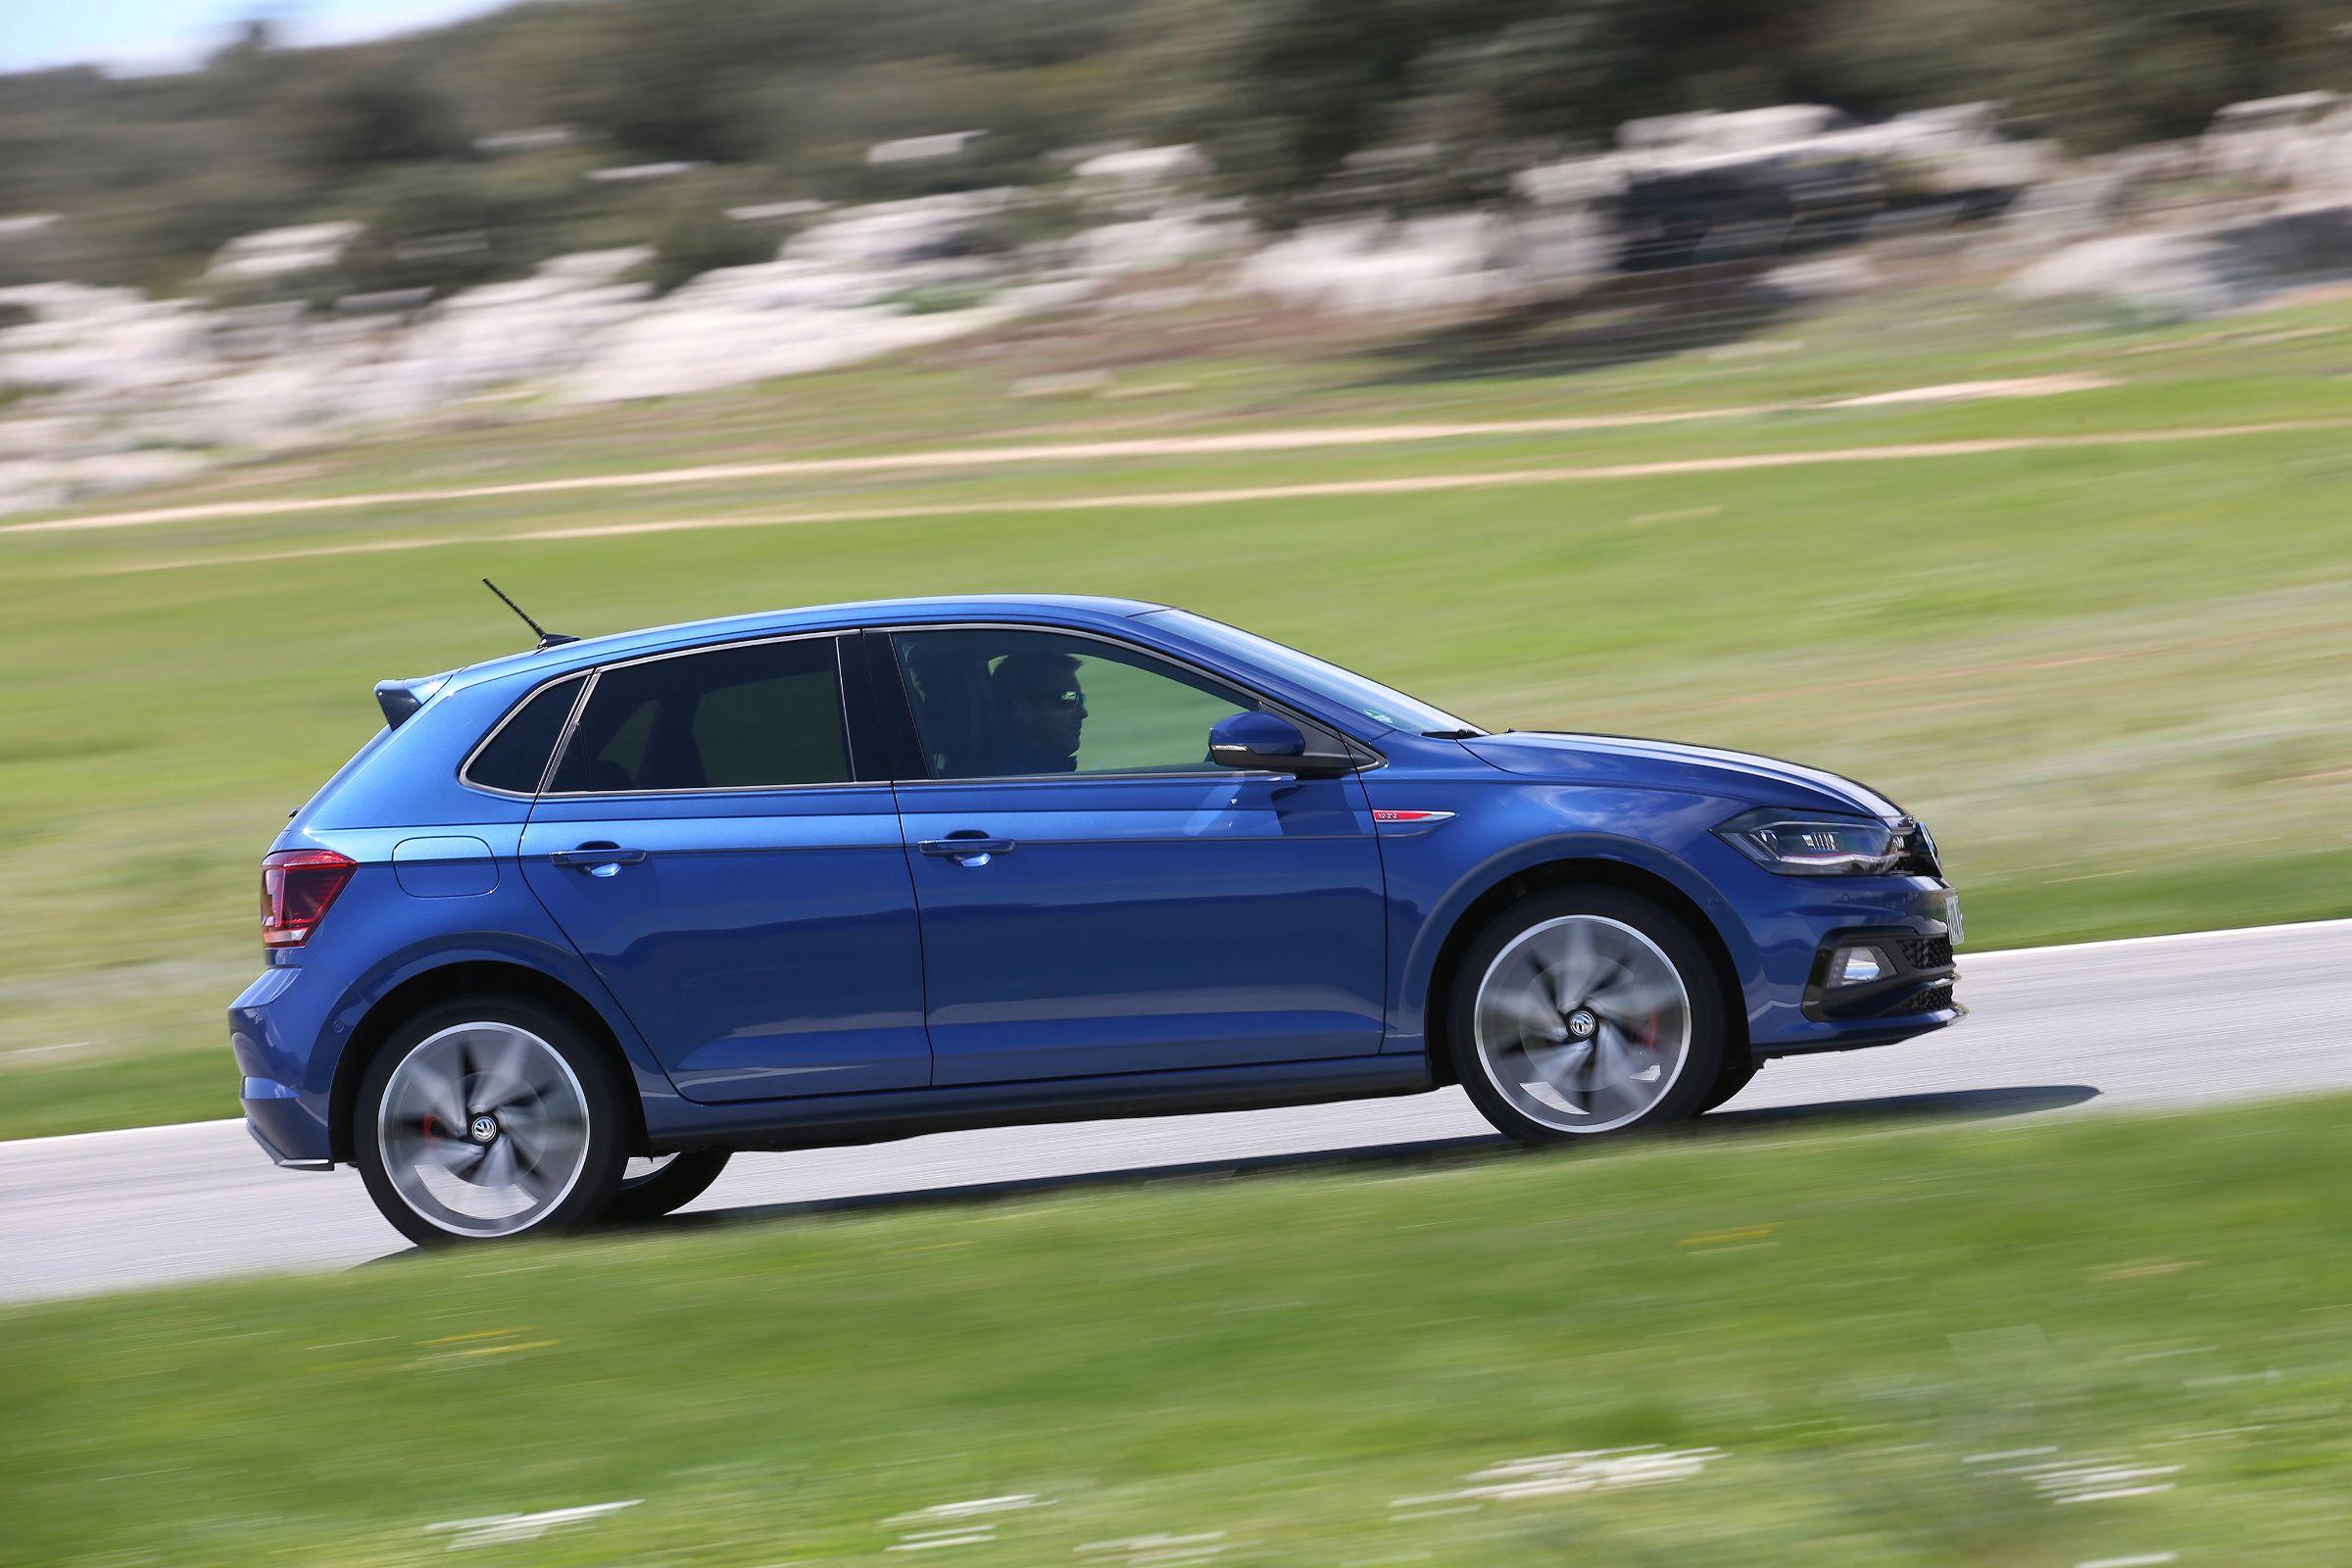 Na Europa, VW vende o Polo GTI; por aqui, deve ser o GTS